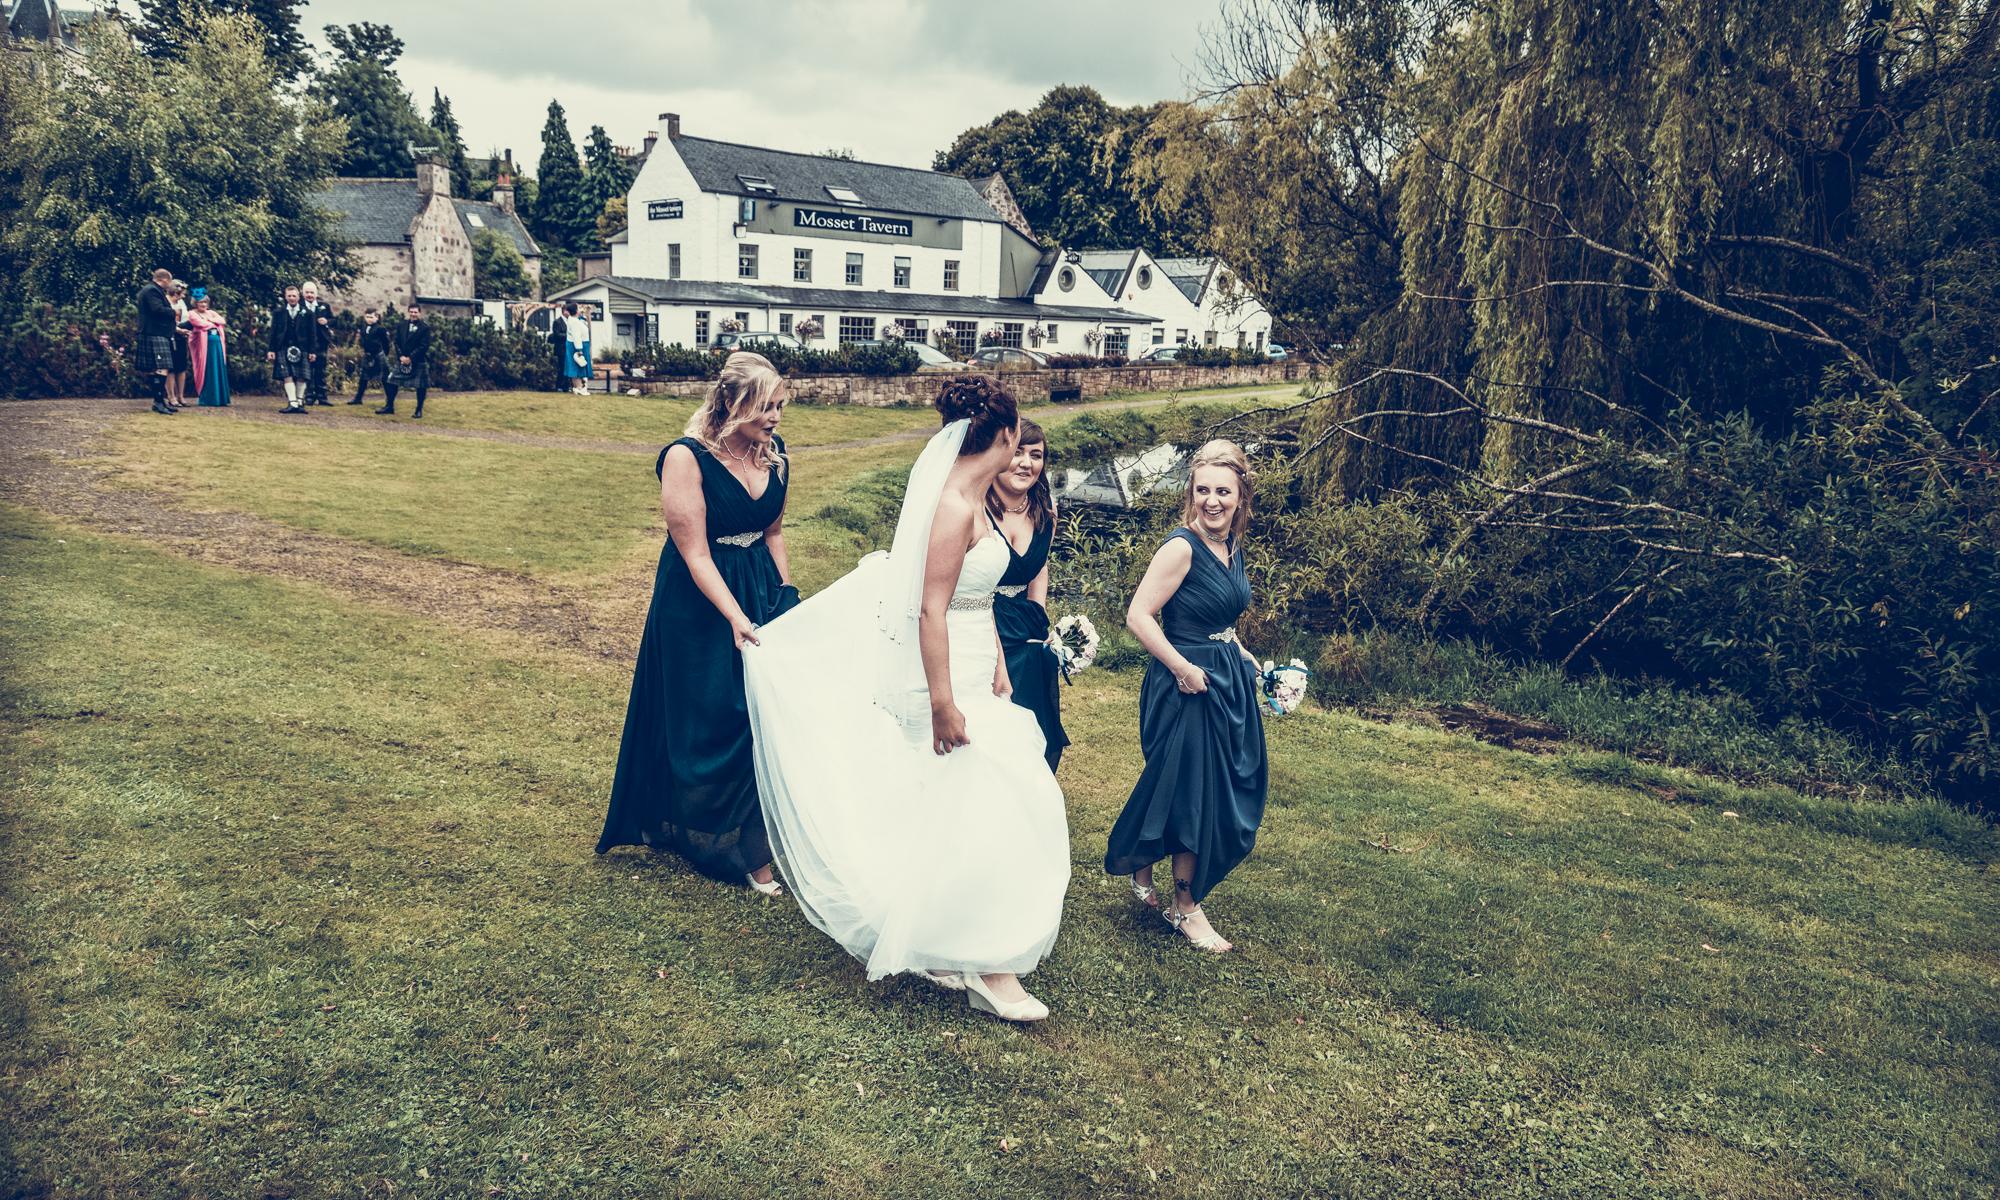 Wedding Photographer in the Highlands, Edinburgh and Scotland